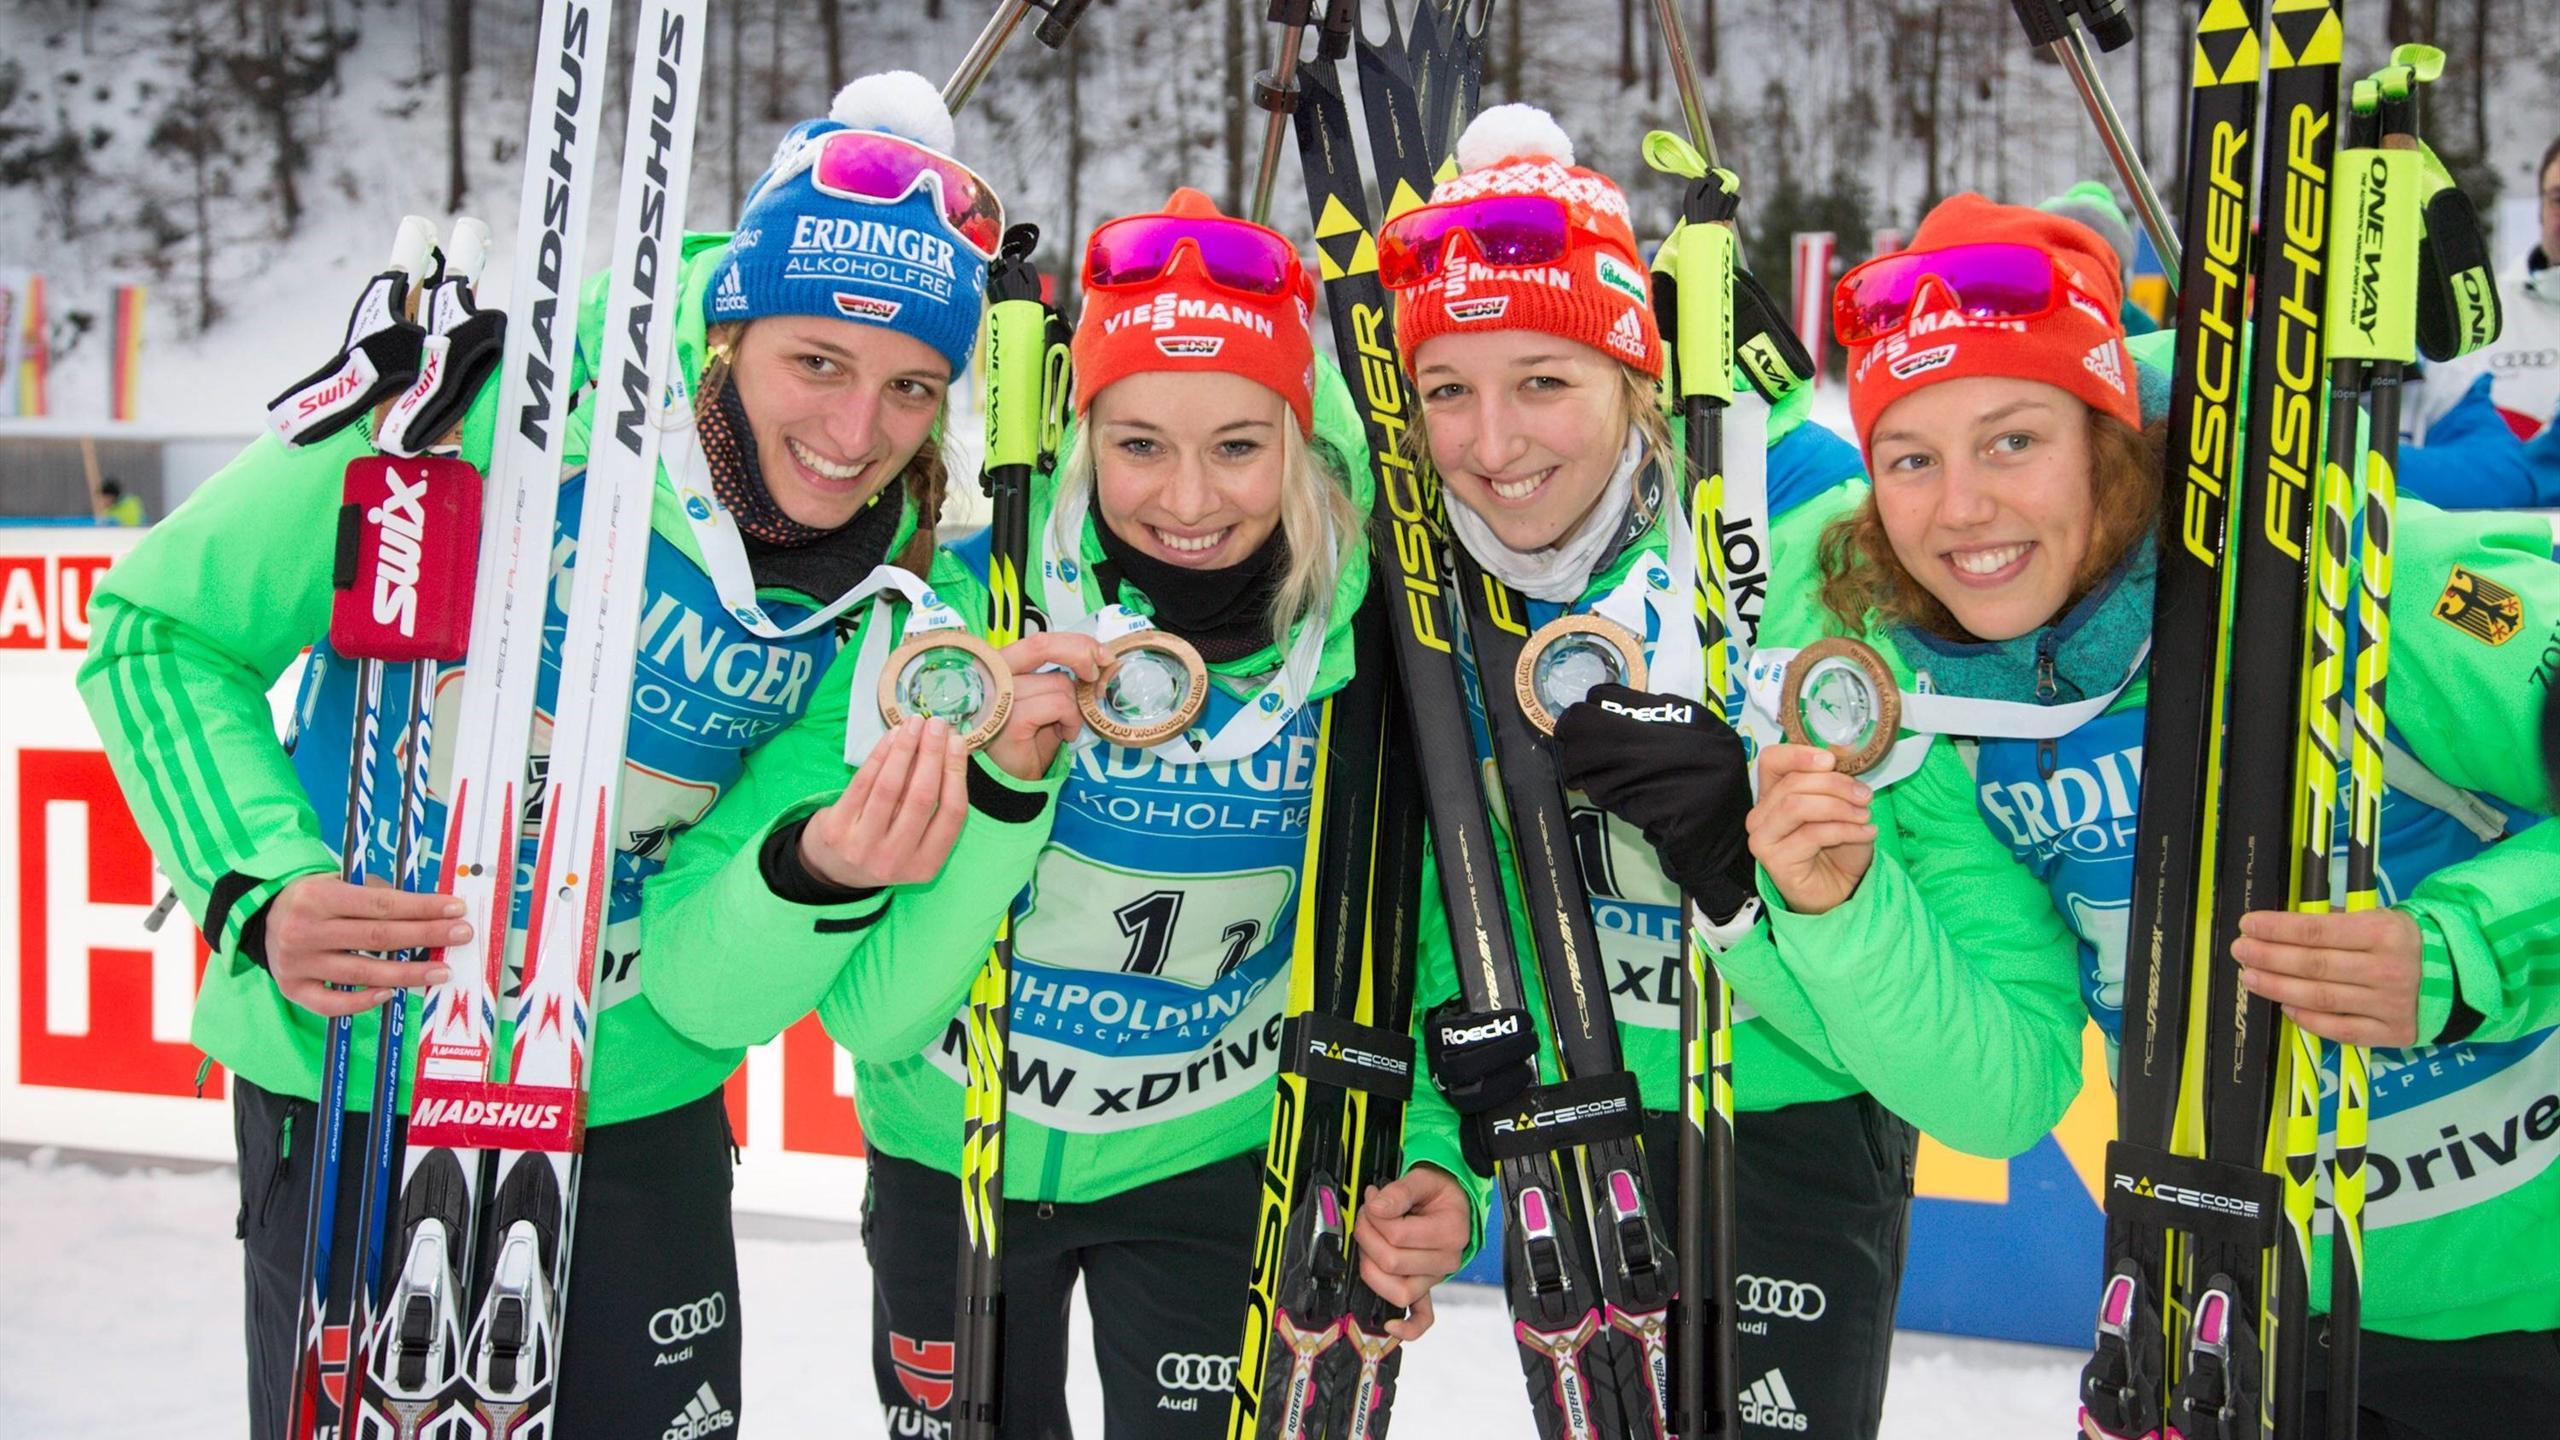 Vanessa Hinz, Maren Hammerschmidt, Franziska Preuß und Laura Dahlmeier